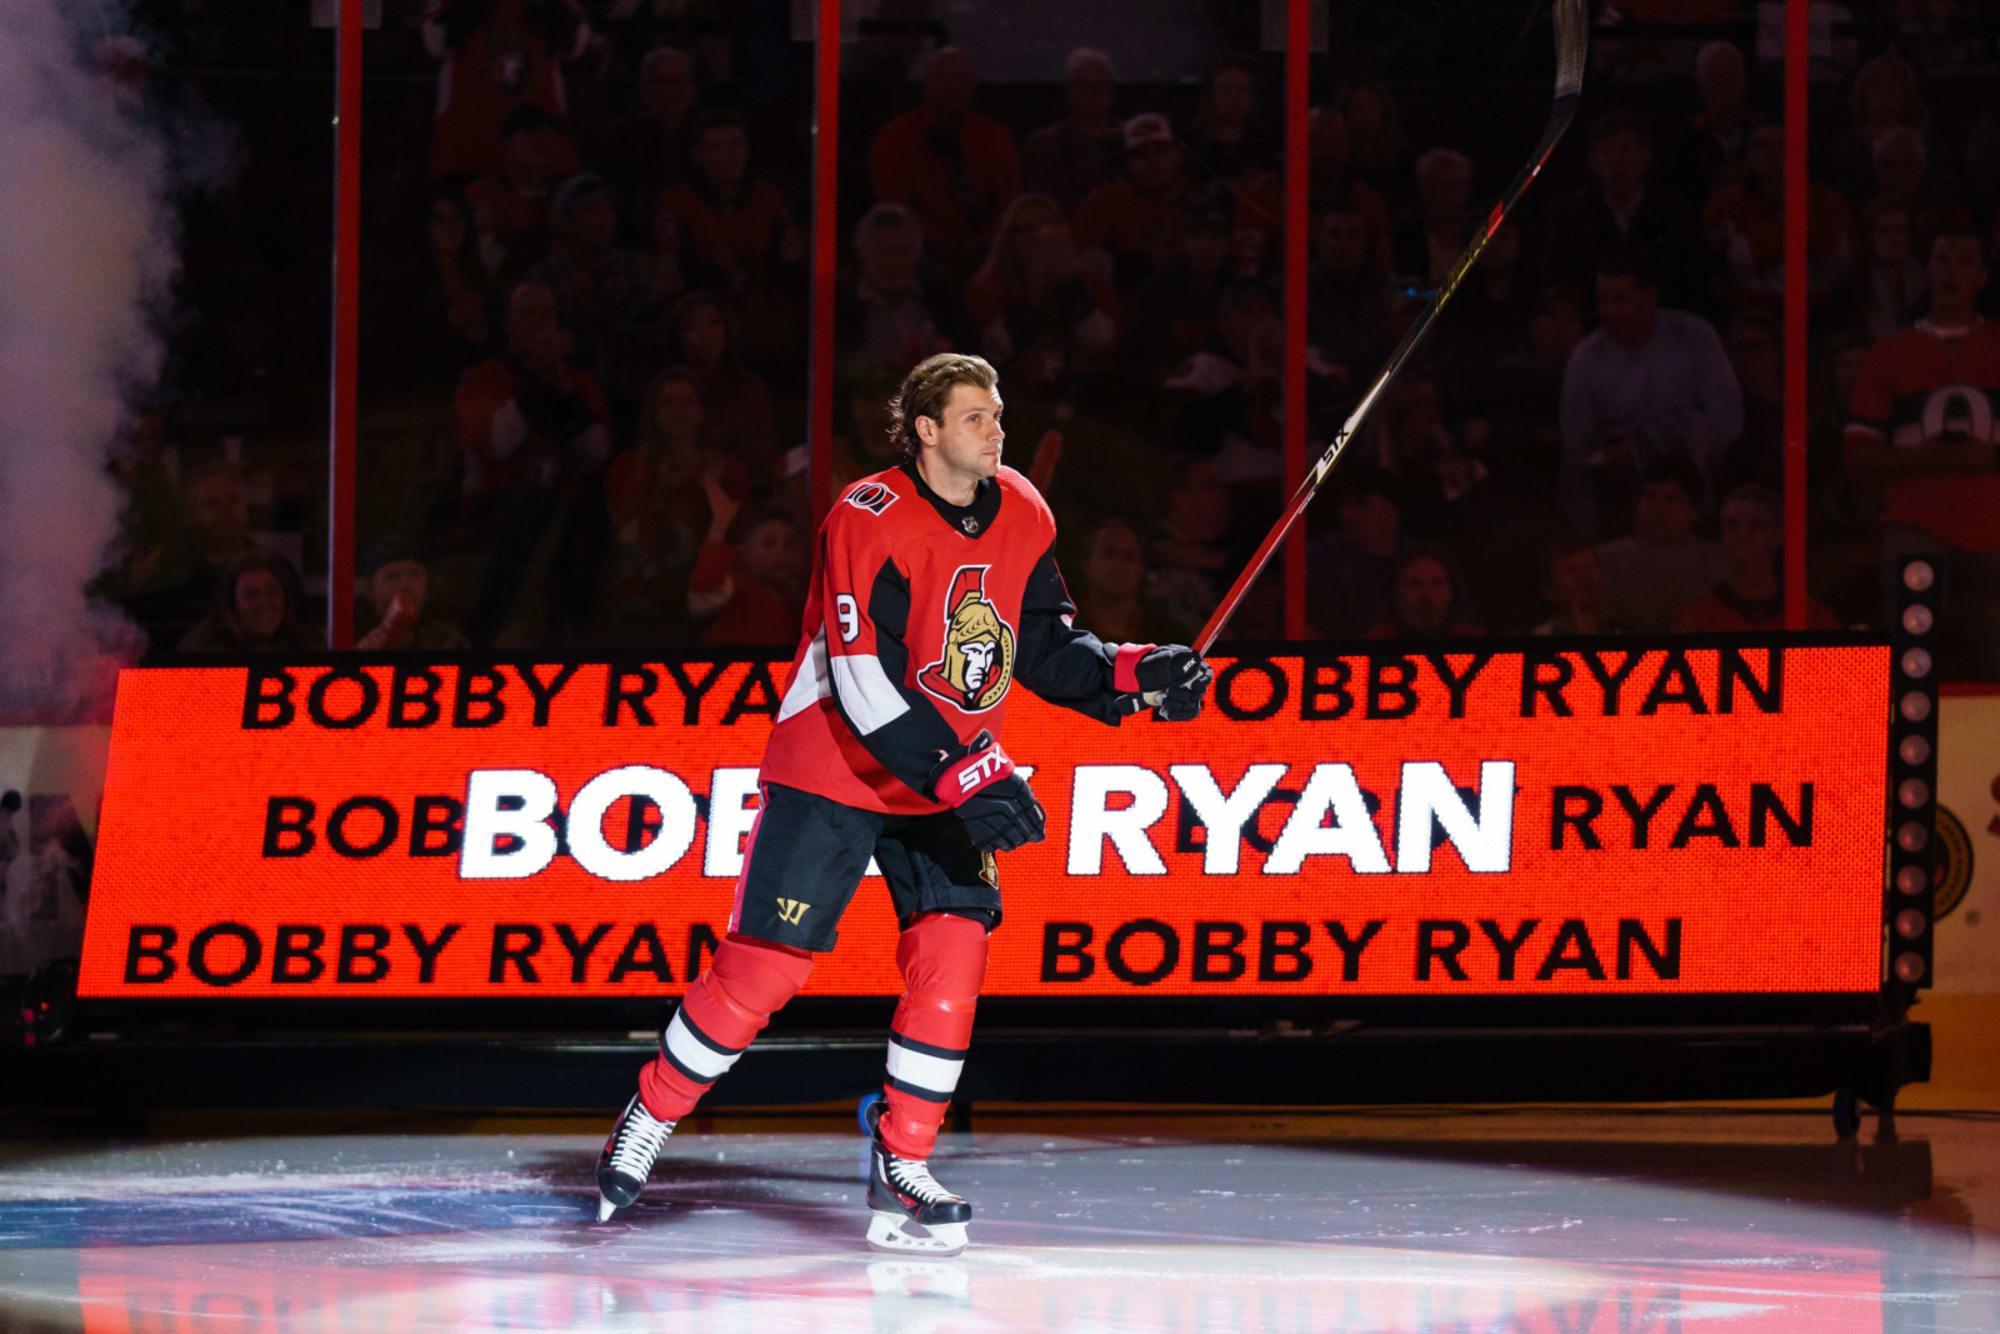 Bobby Ryan Ottawa Senators Player Swingman Jersey